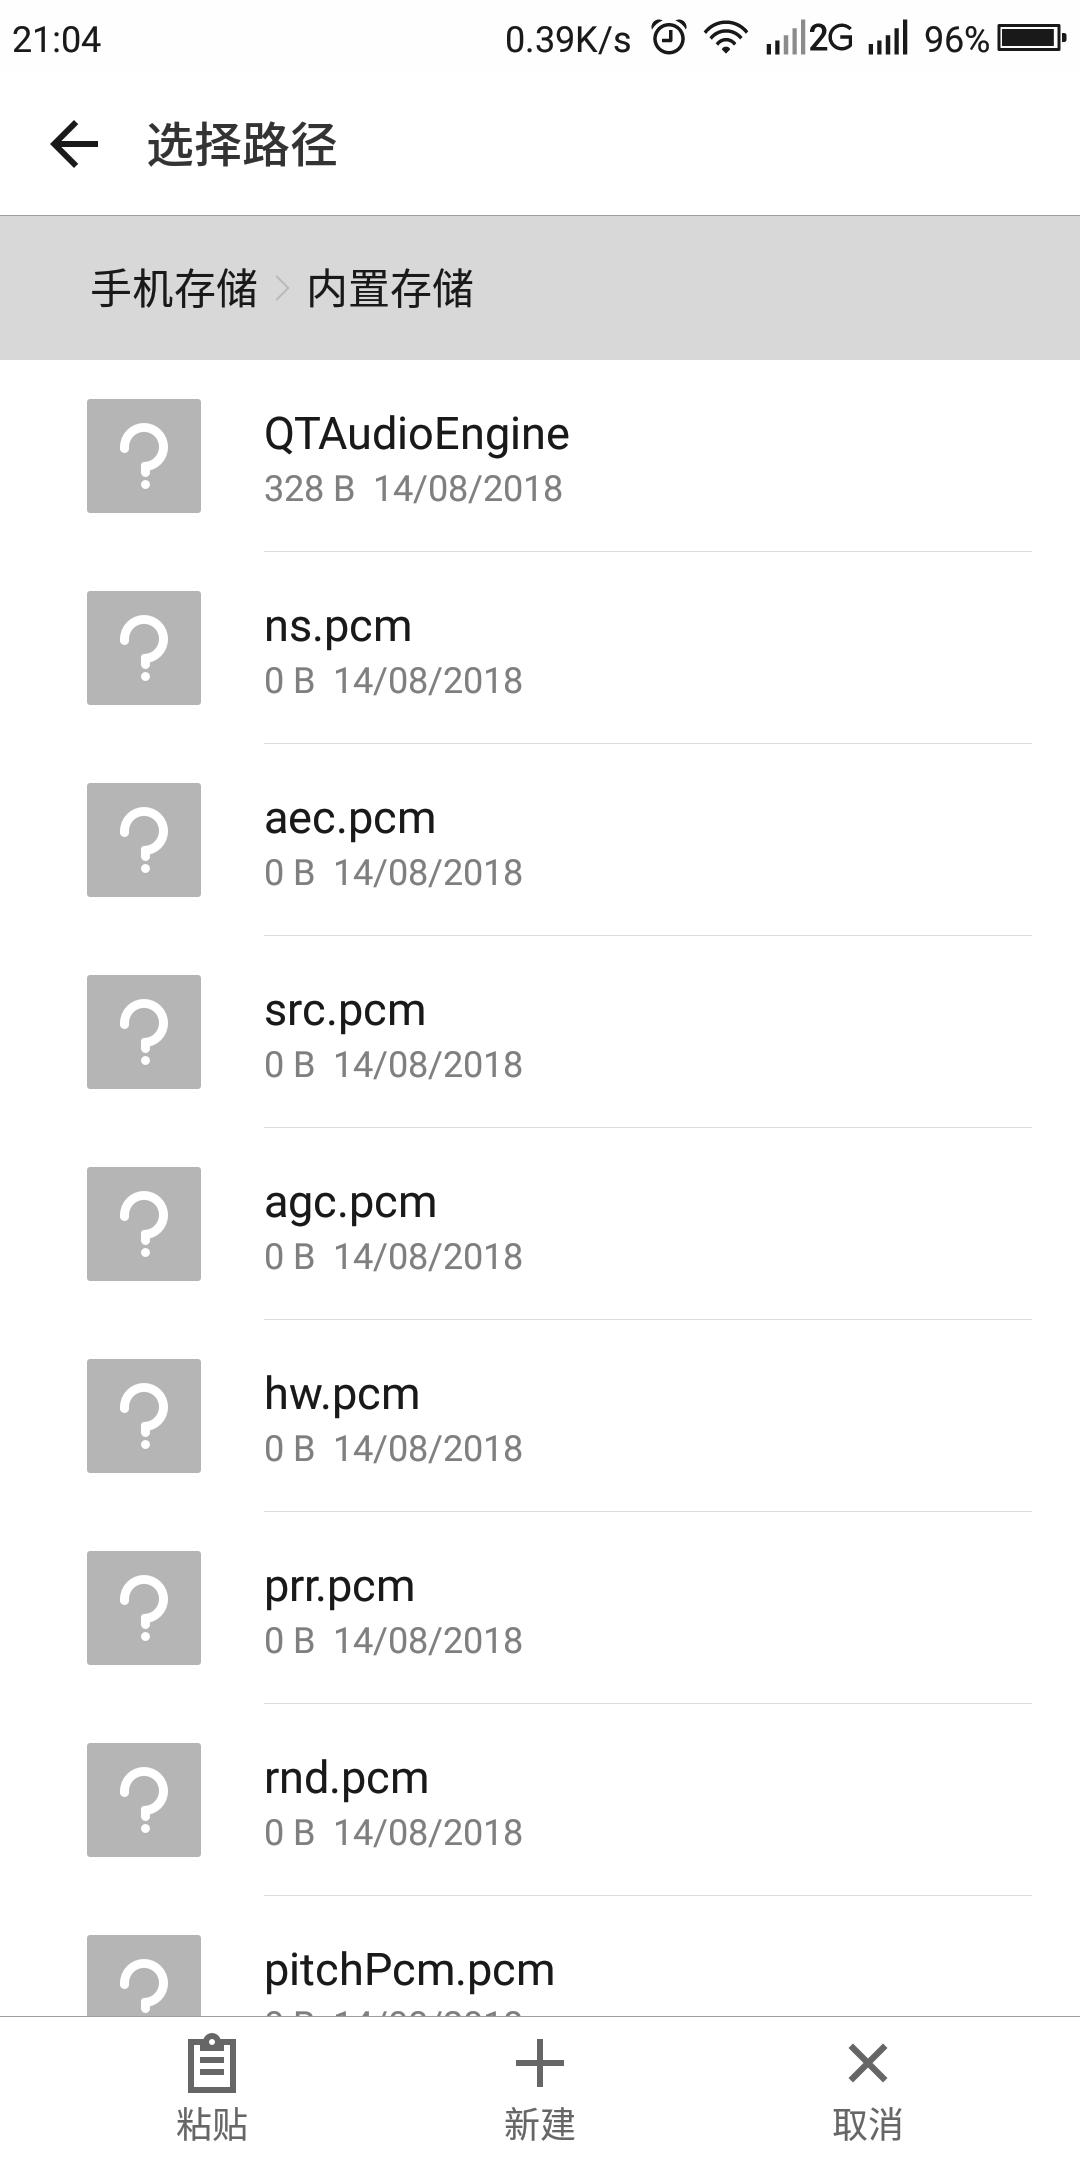 Screenshot_2018-08-14-21-04-58.png